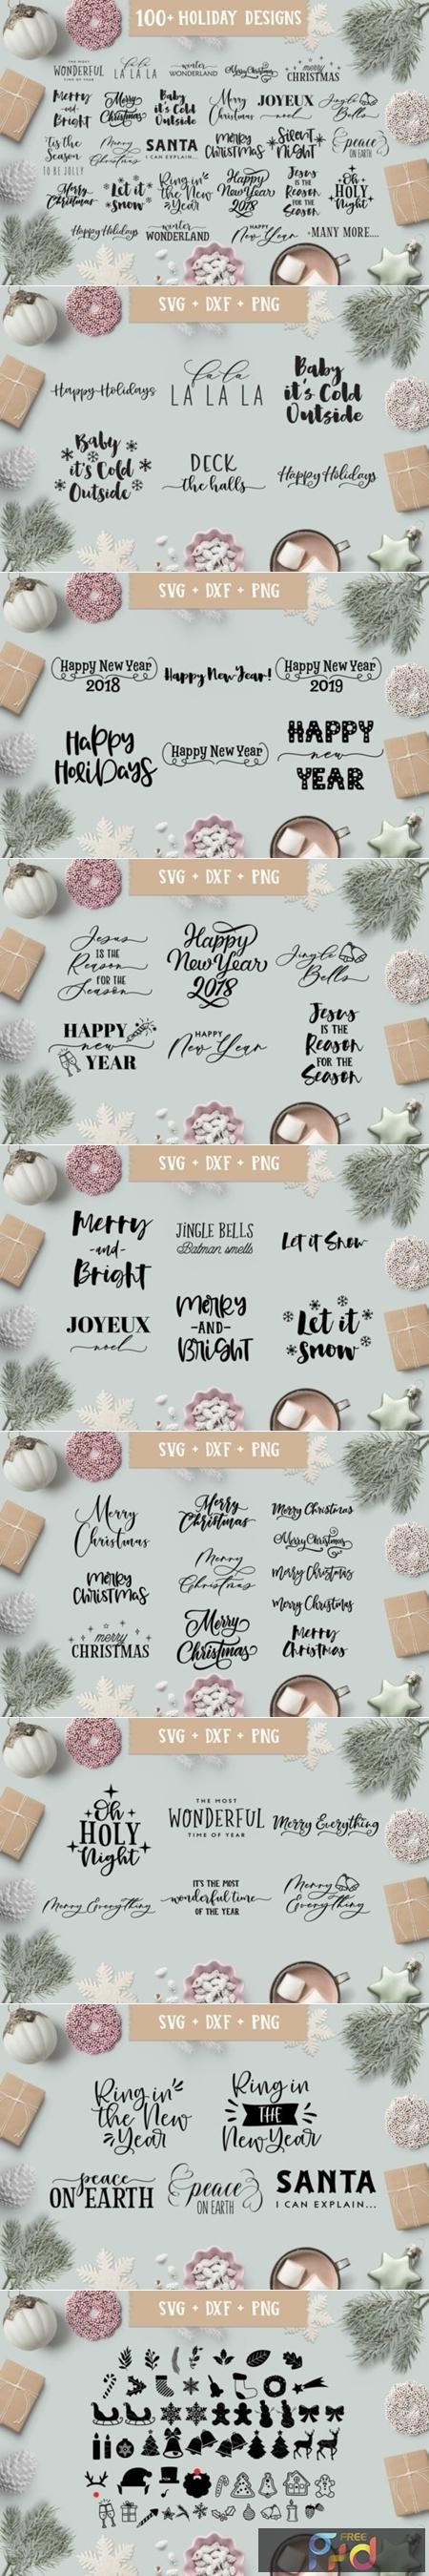 Christmas-Holiday Quotes SVG Bundle 2012477 1